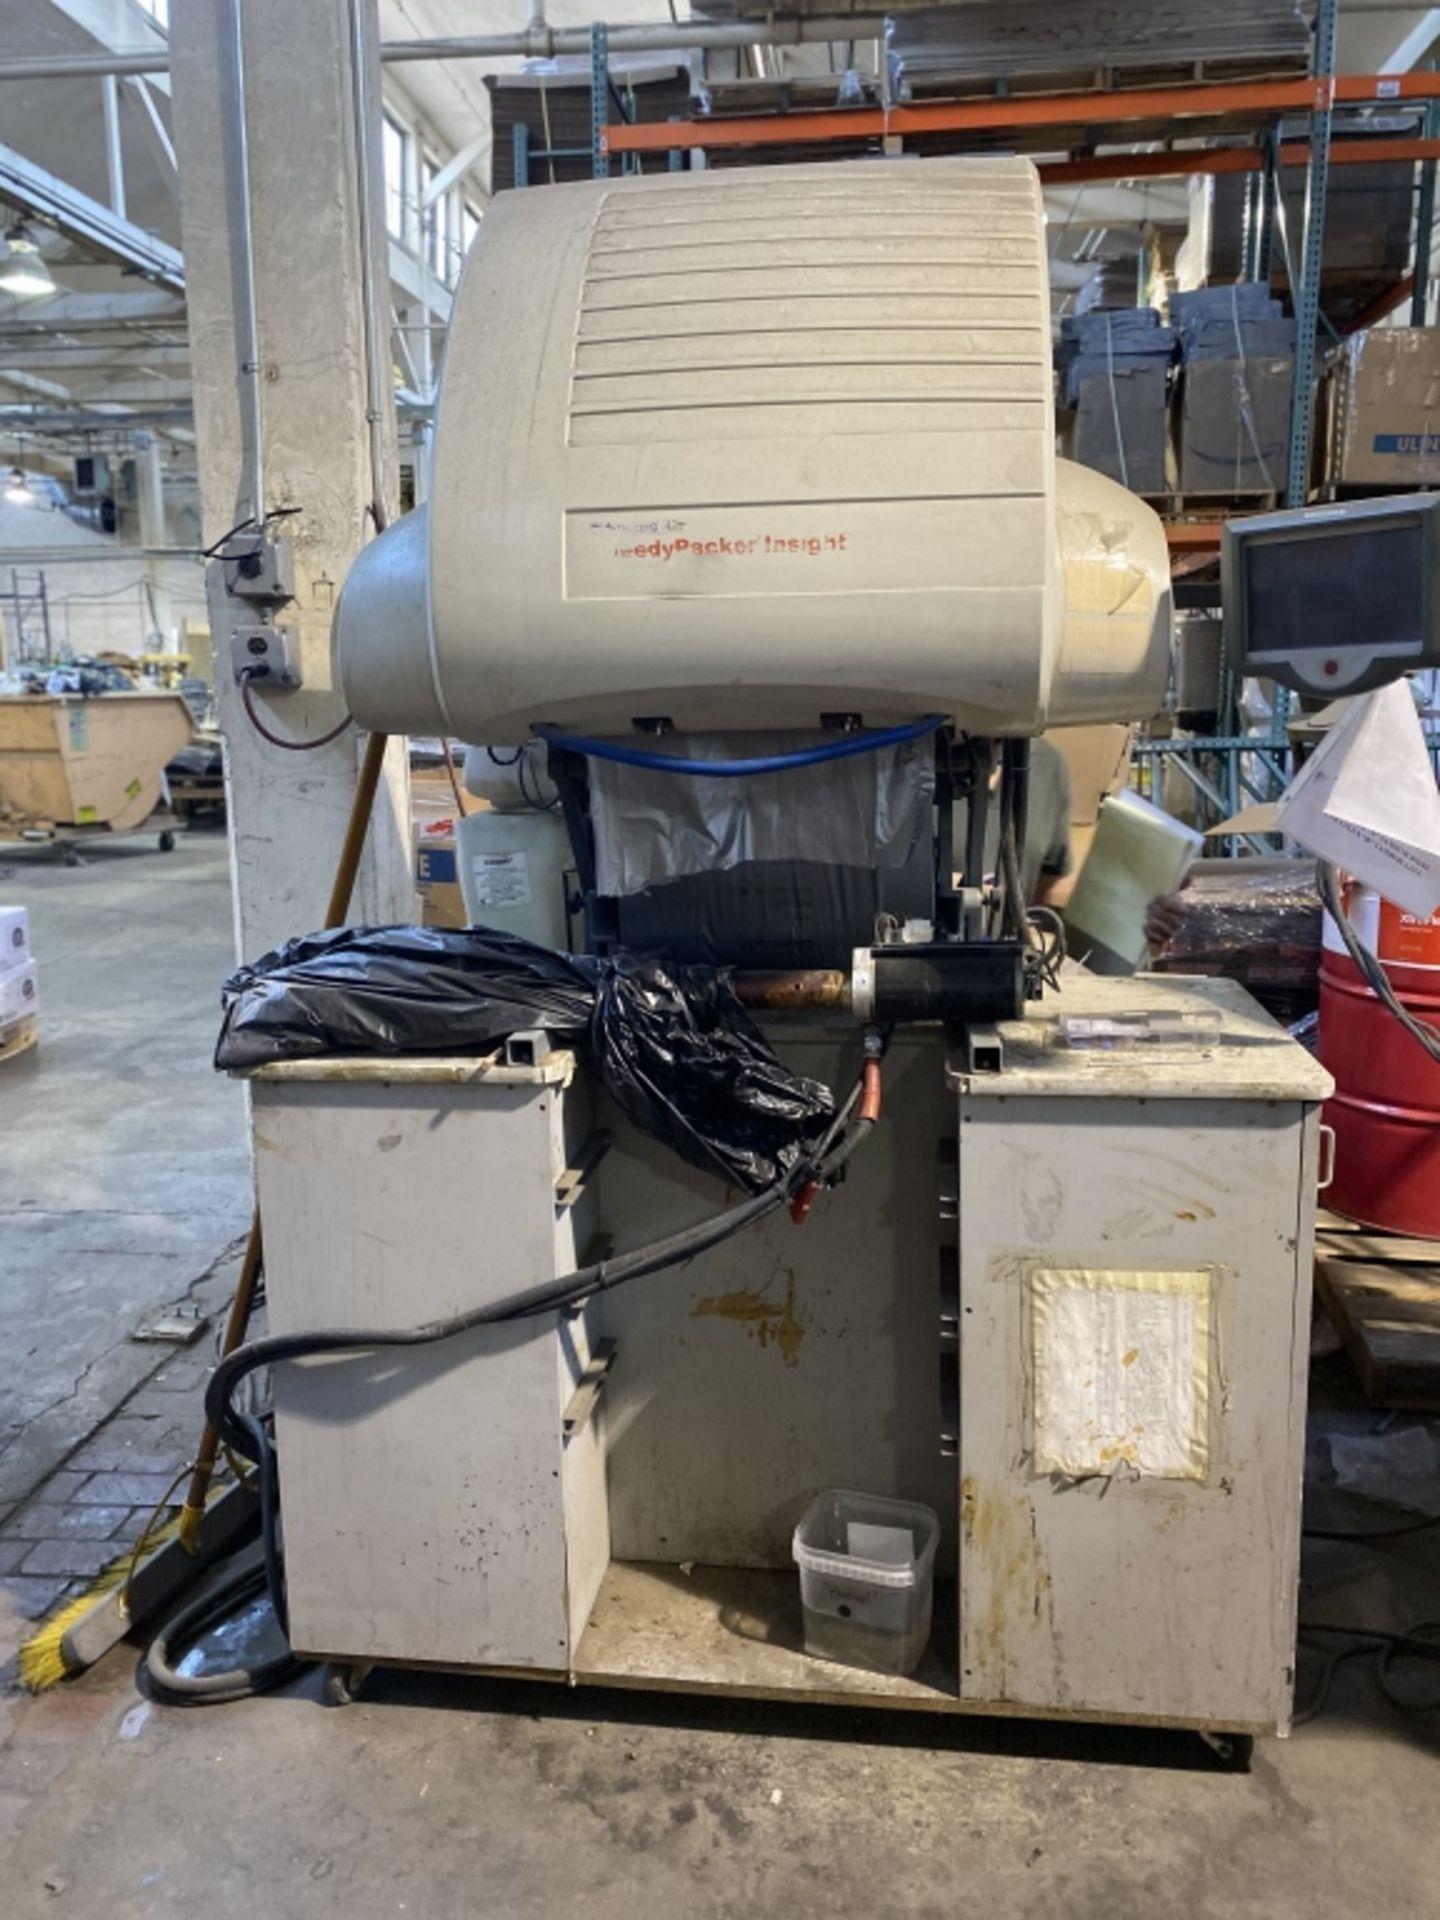 Lot 1001 - Sealed Air Speedy Packer